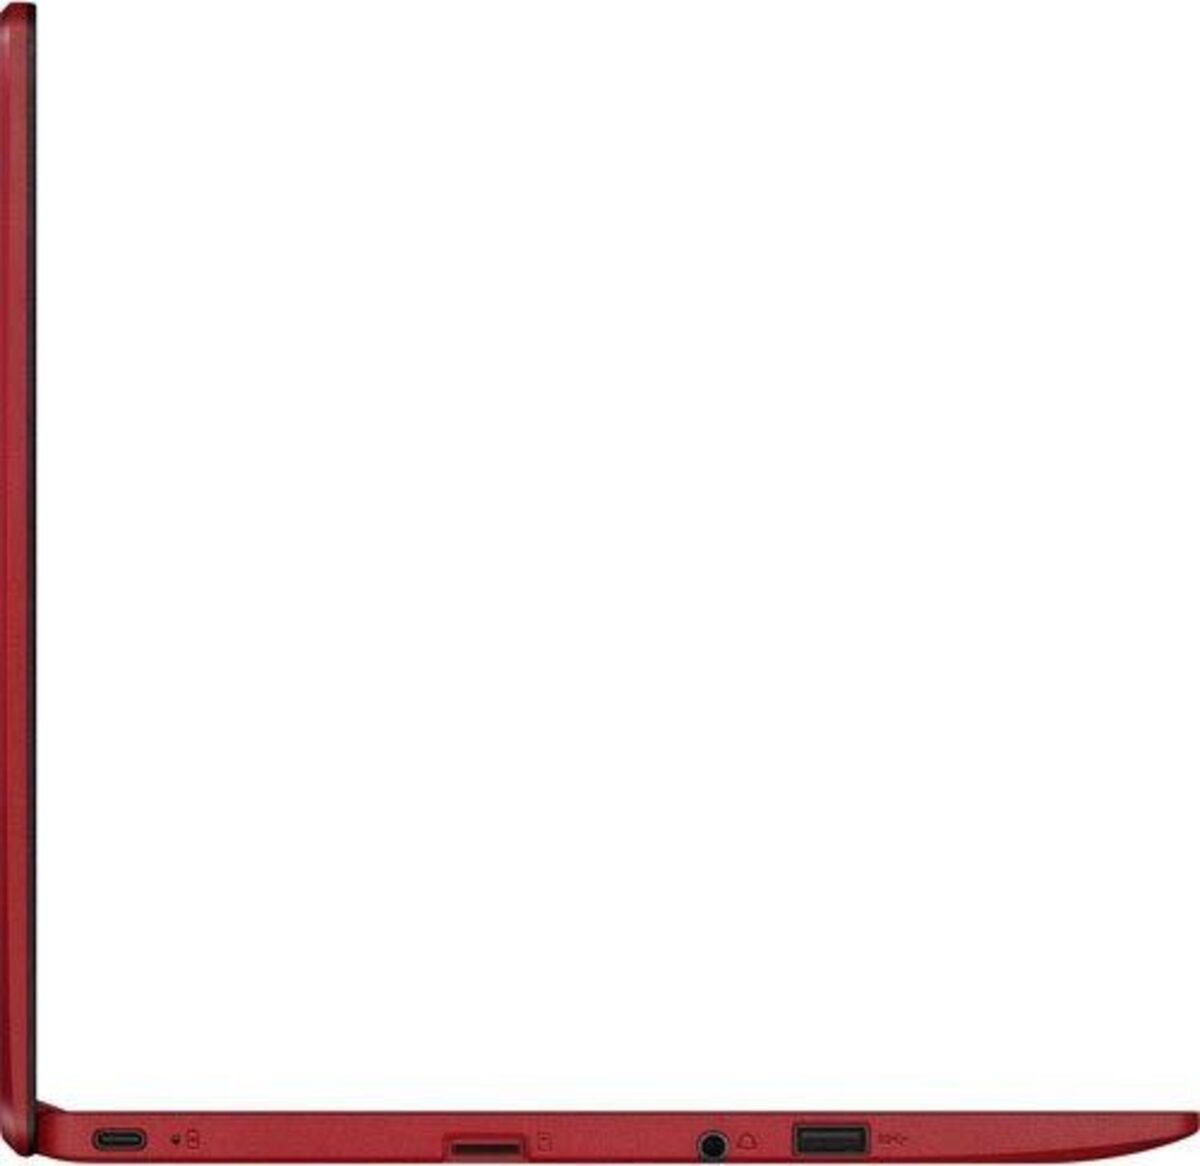 Bild 2 von Asus C223NA-GJ0077 Chromebook (29,46 cm/11,6 Zoll, Intel Celeron, HD Graphics 500)